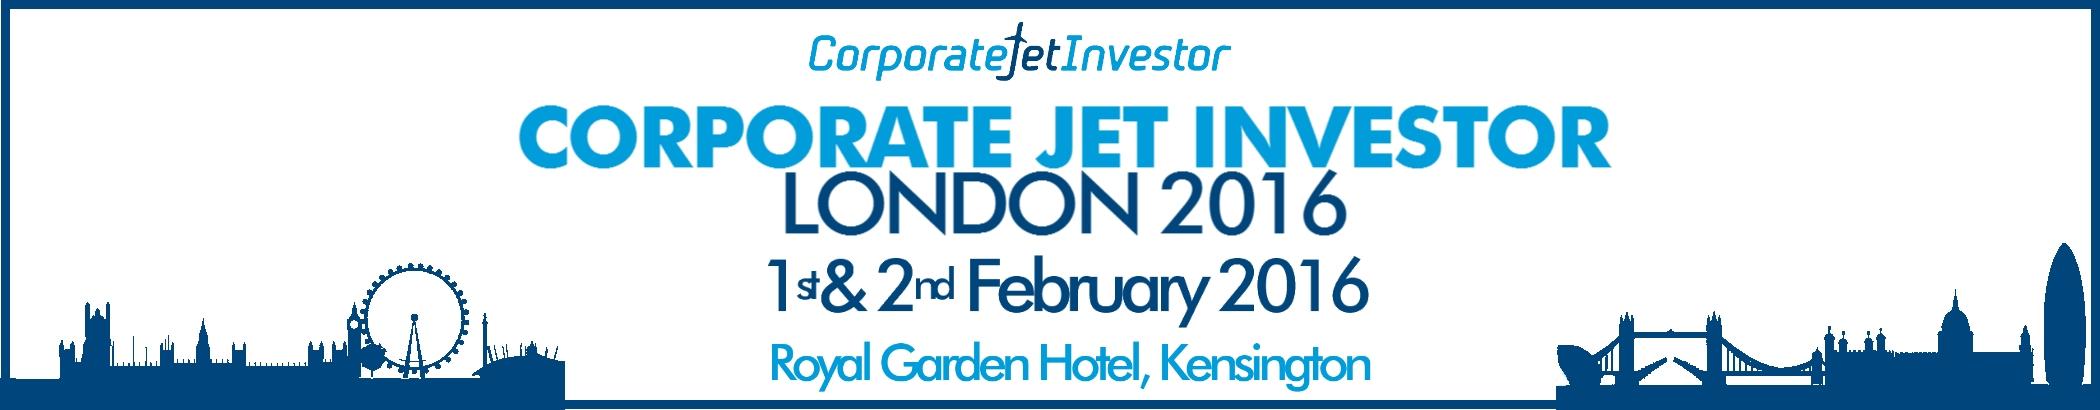 London Jet banner 16